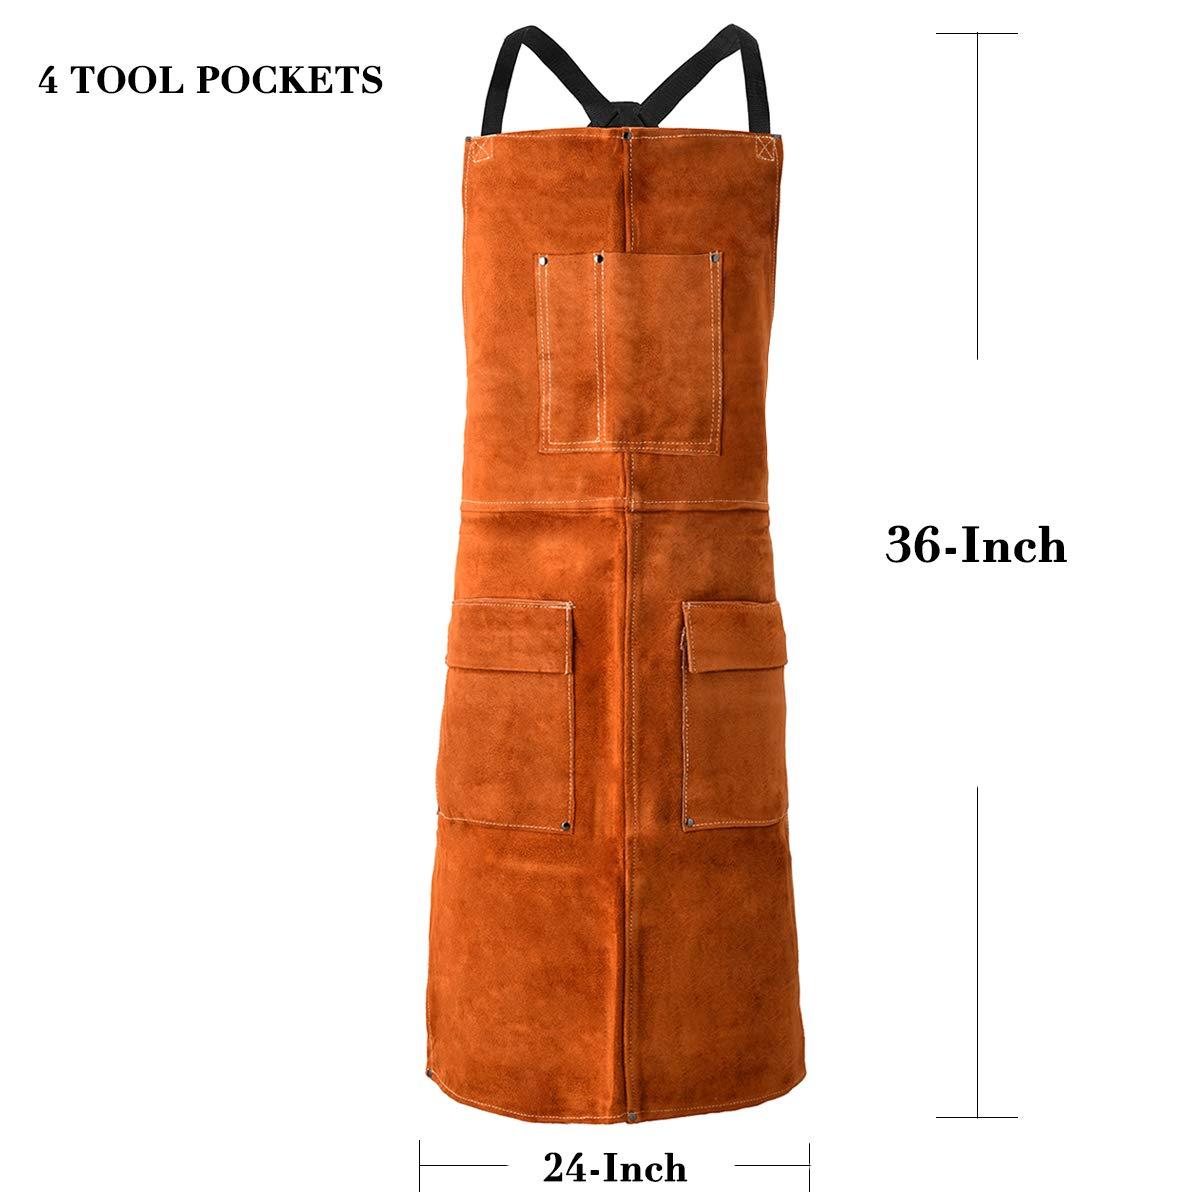 LEASEEK Leather Welding Work Apron - Heat Resistant & Flame Resistant Bib Apron, Flame Retardant Heavy Duty BBQ Apron, Adjustable One Size Fit Most - 24'' X 36'',Brown (Brown) by LeaSeeK (Image #2)